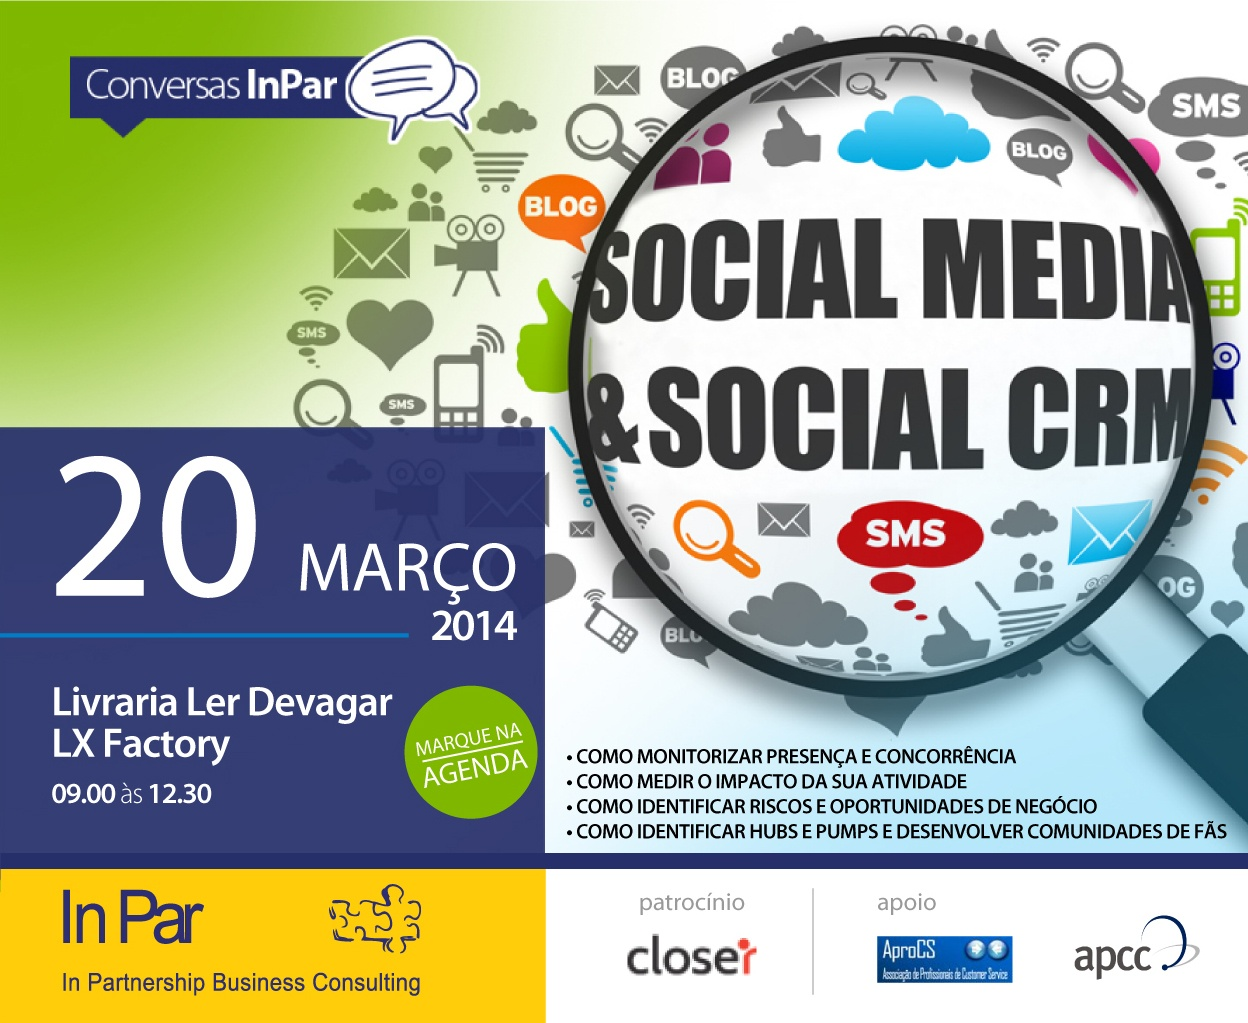 Social Media e Social CRM